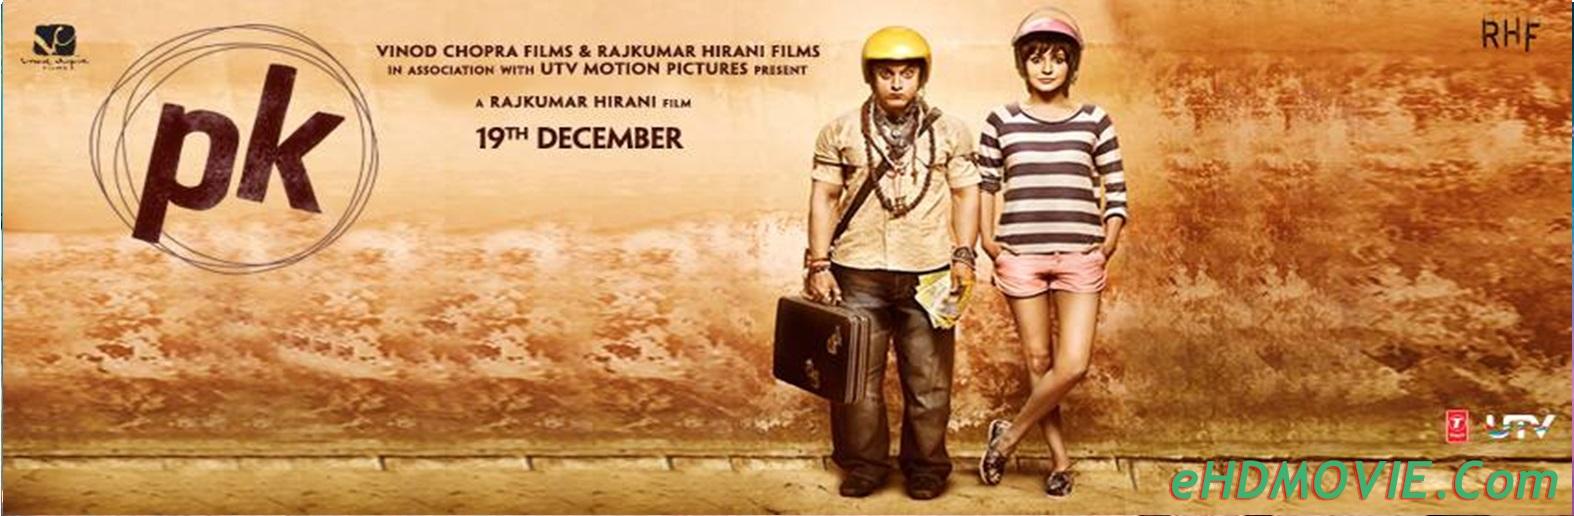 PK 2014 Full Movie Hindi 720p - 480p ORG BRRip 600MB - 1.4GB ESubs Free Download